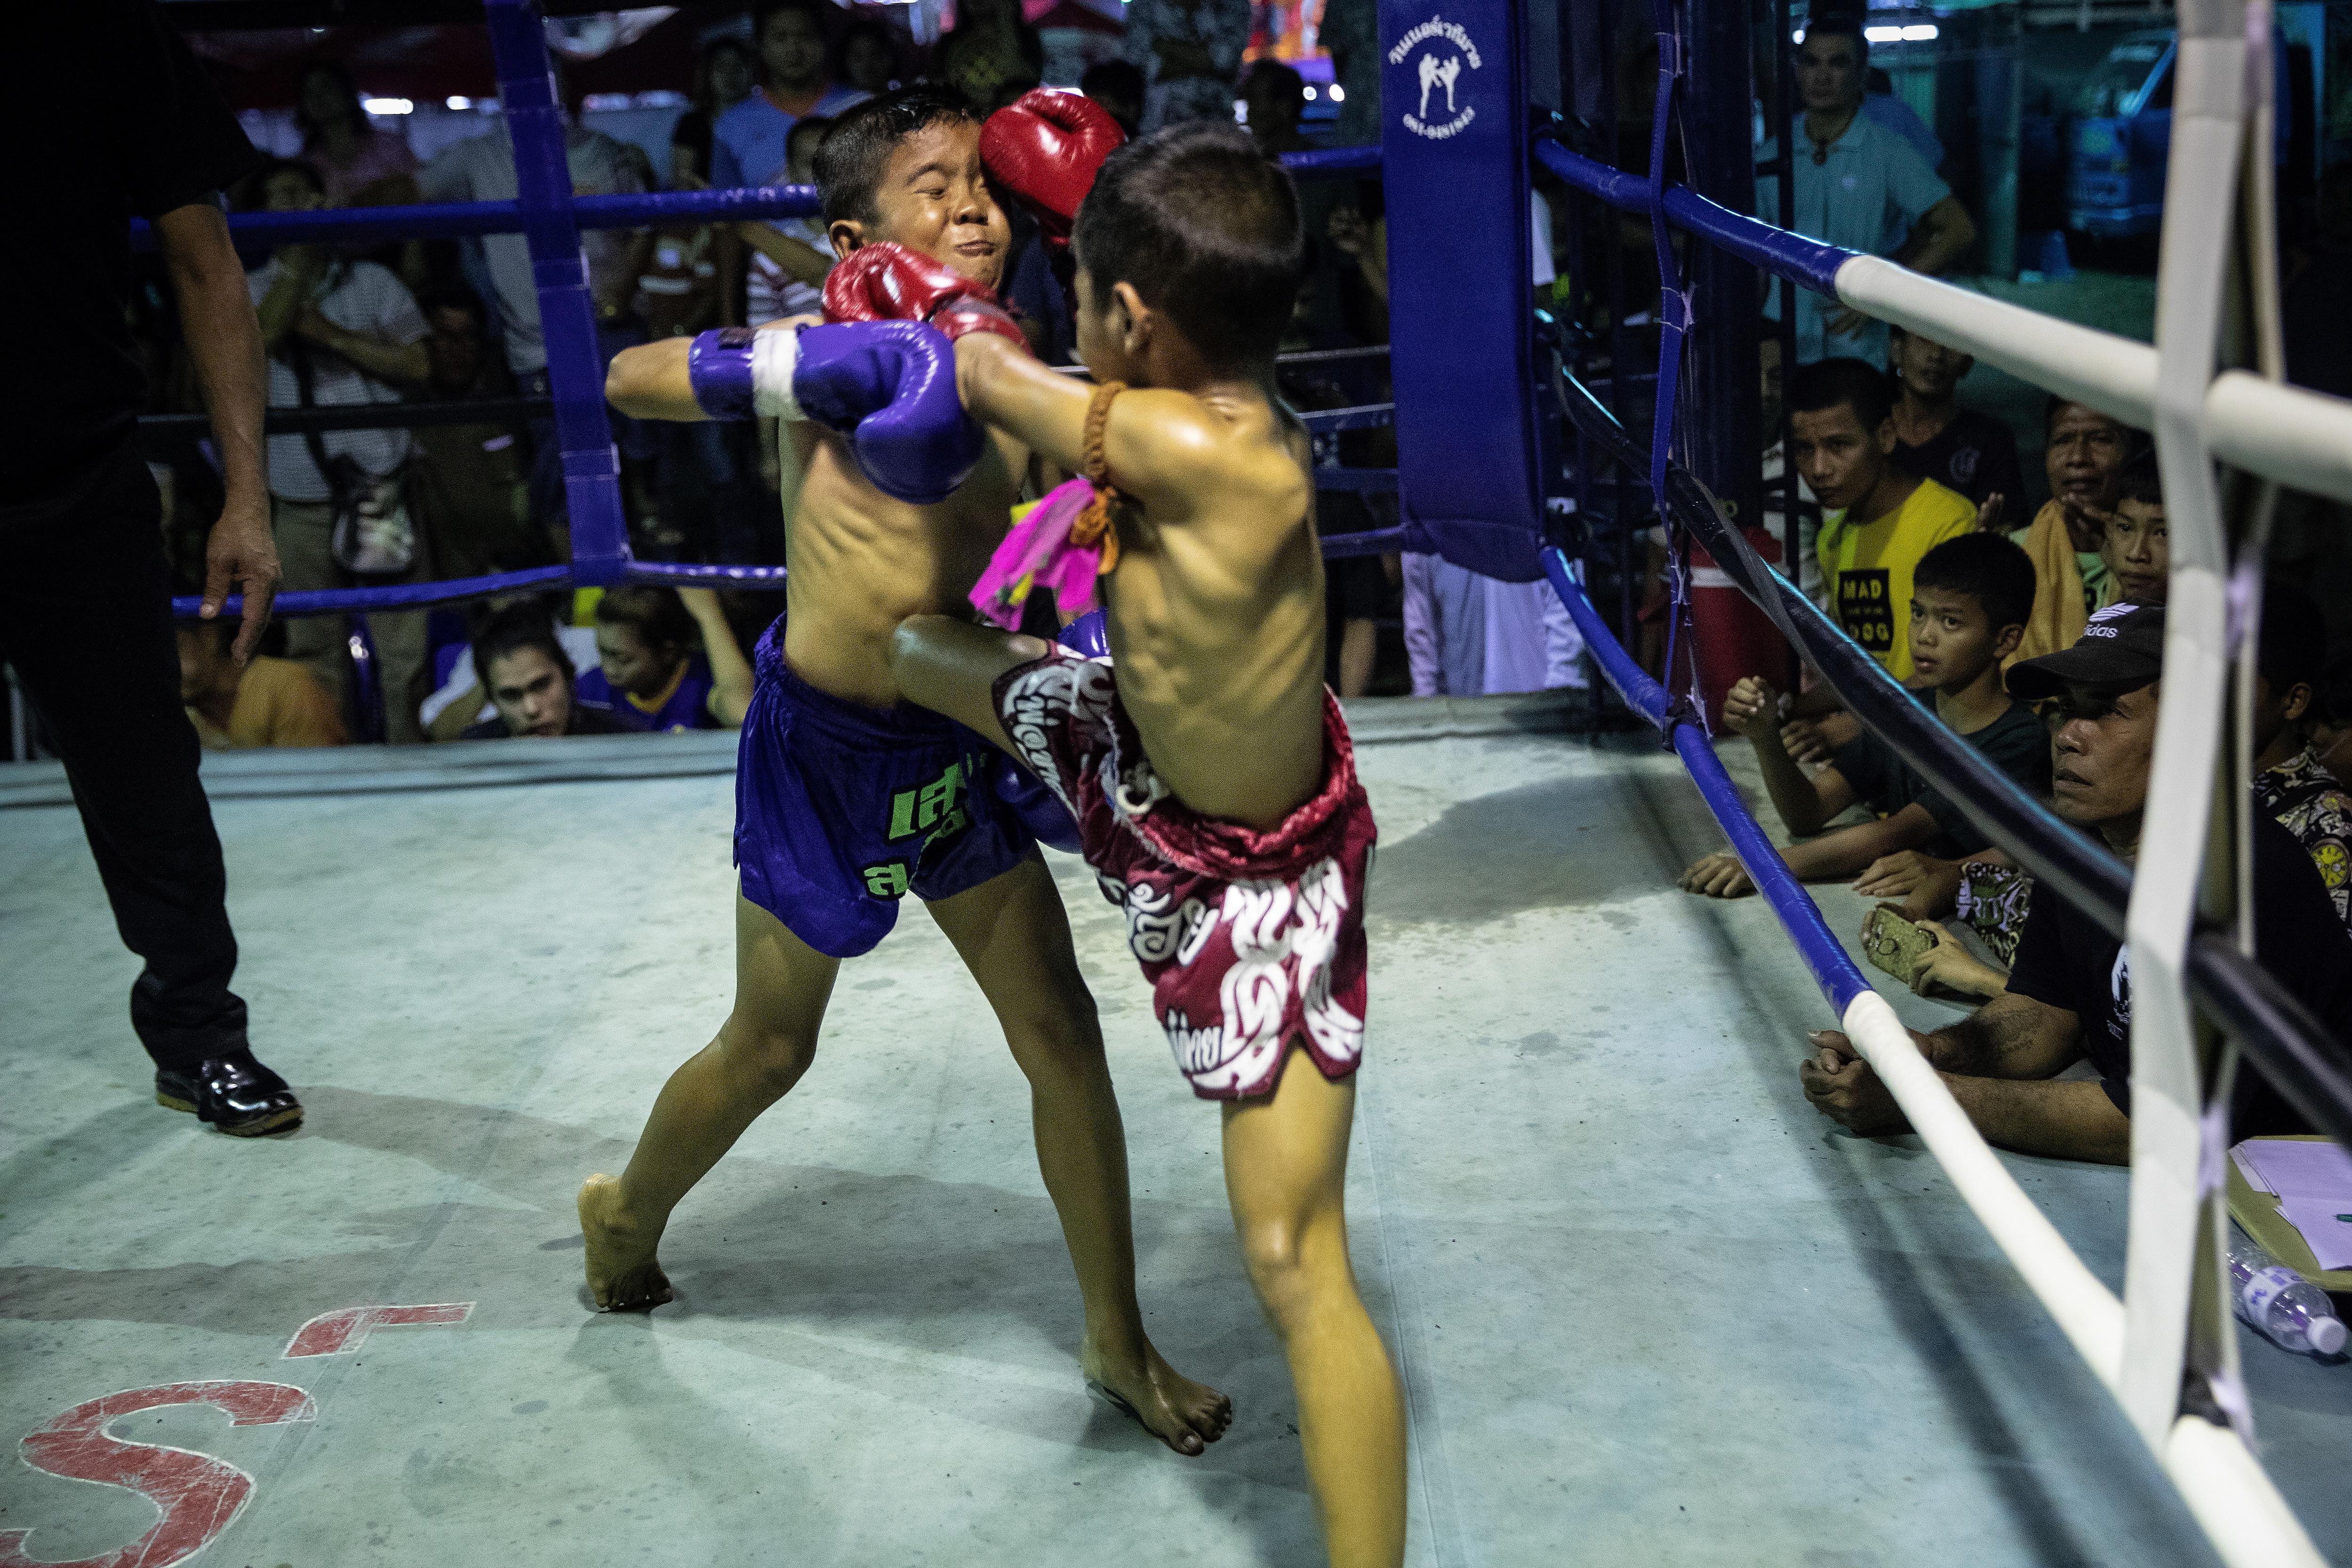 Thailand's Professional Child Boxers